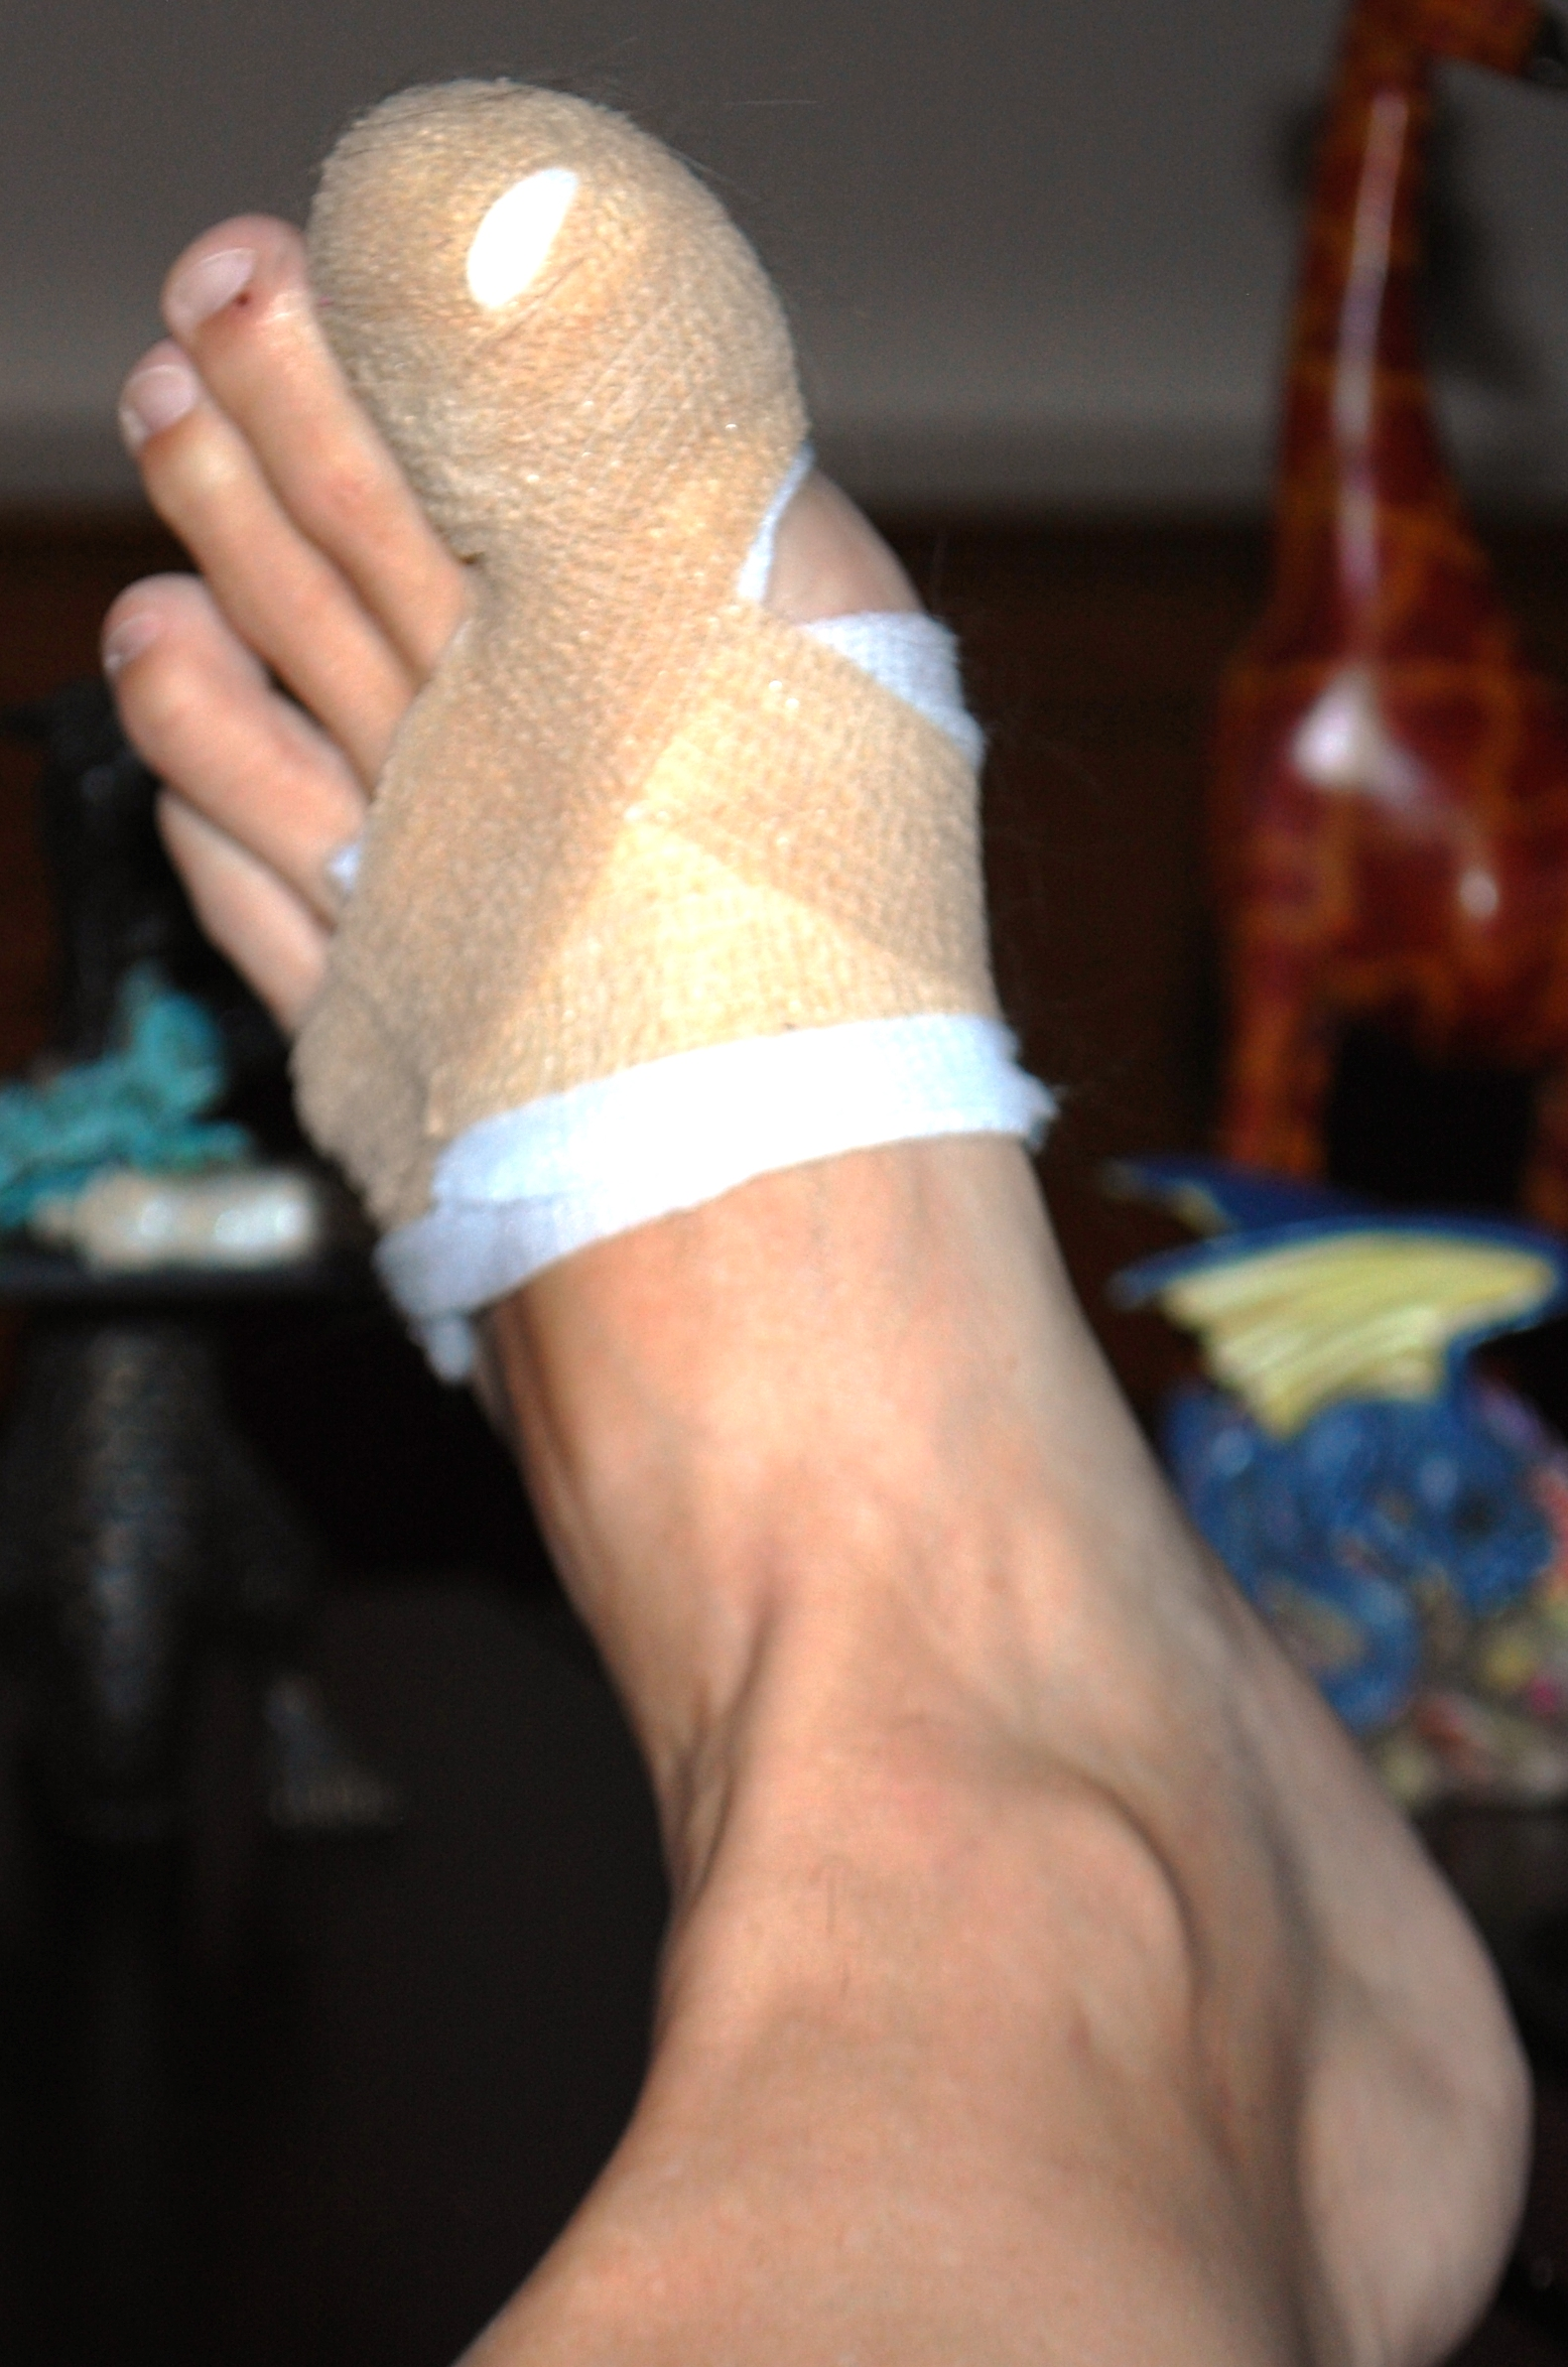 ingrown toe nail | Writing To Wellness